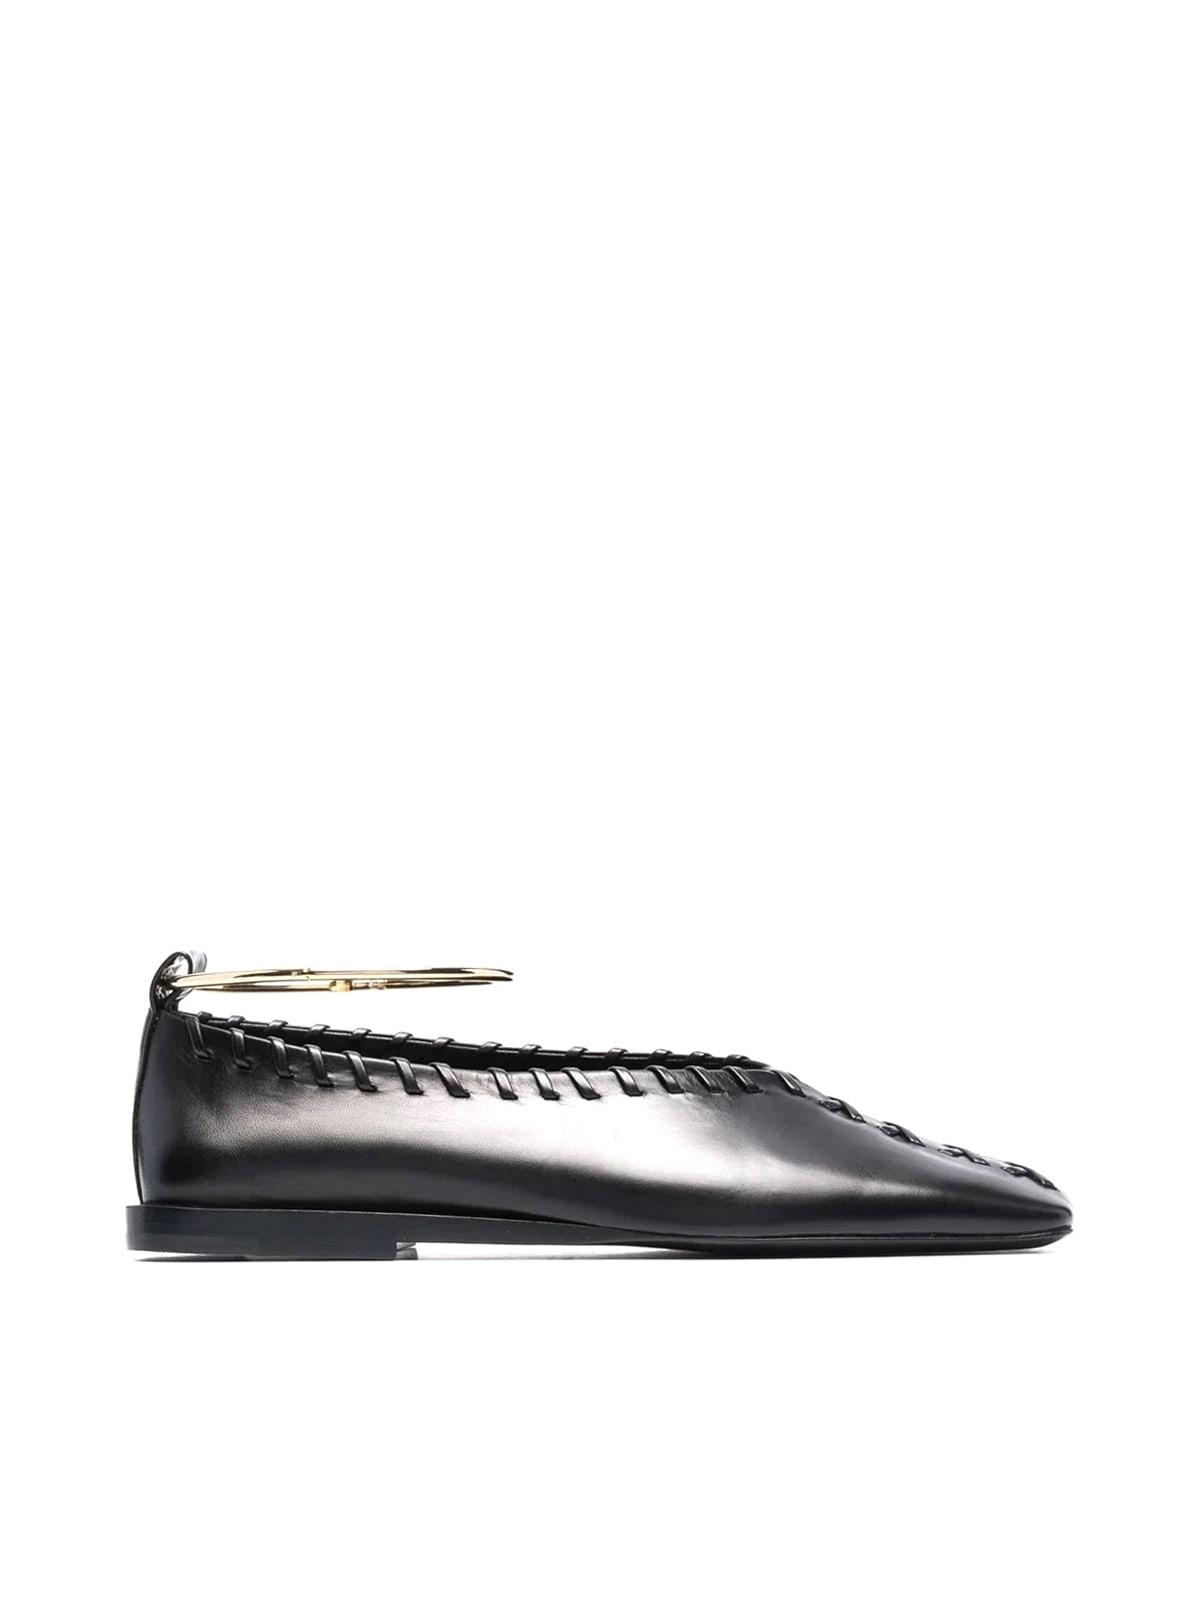 Buy Jil Sander Ballerina - Tripon 999 Nero online, shop Jil Sander shoes with free shipping